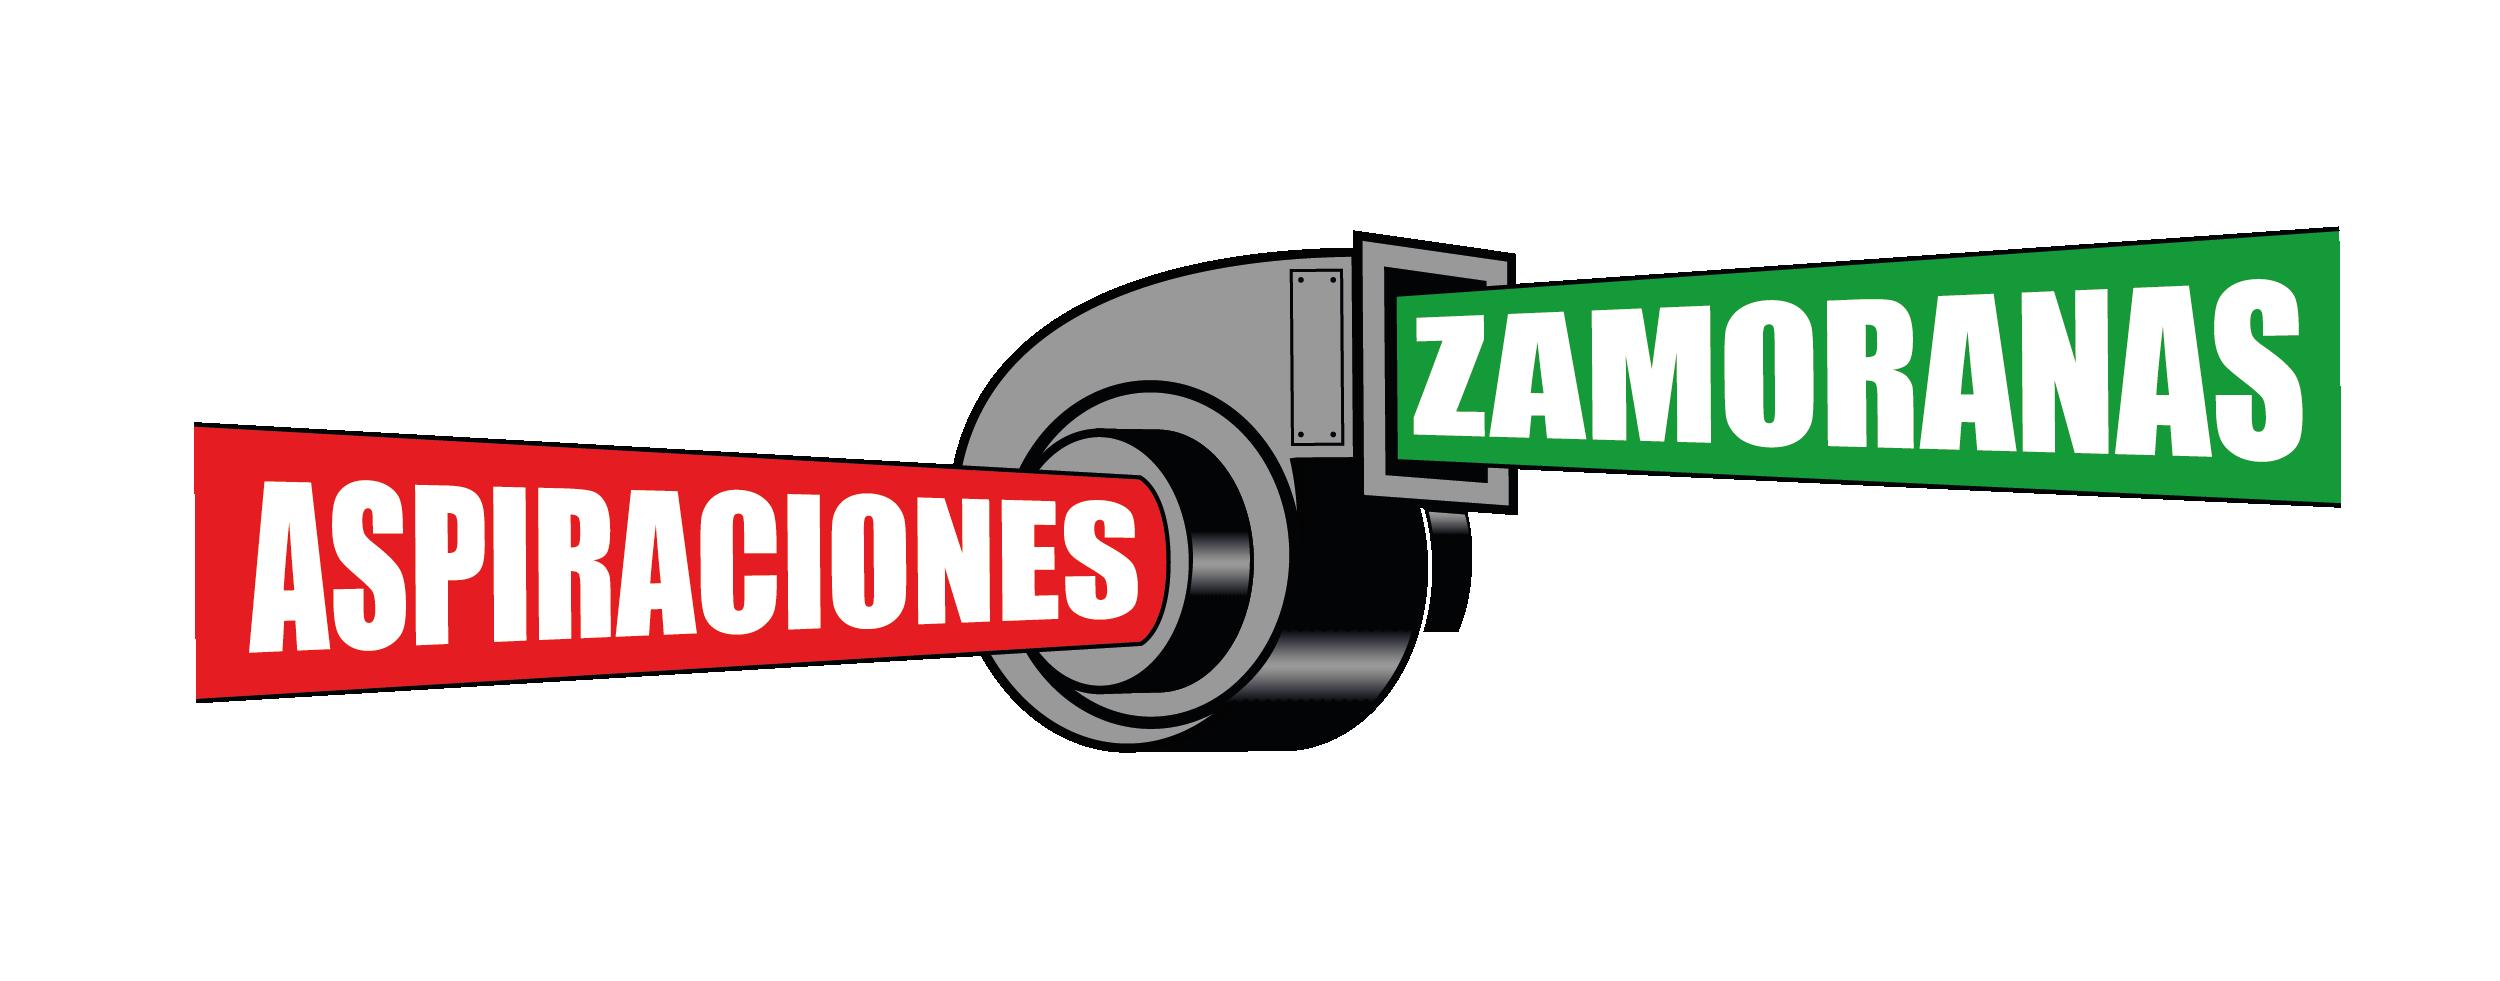 Aspiraciones Zamoranas